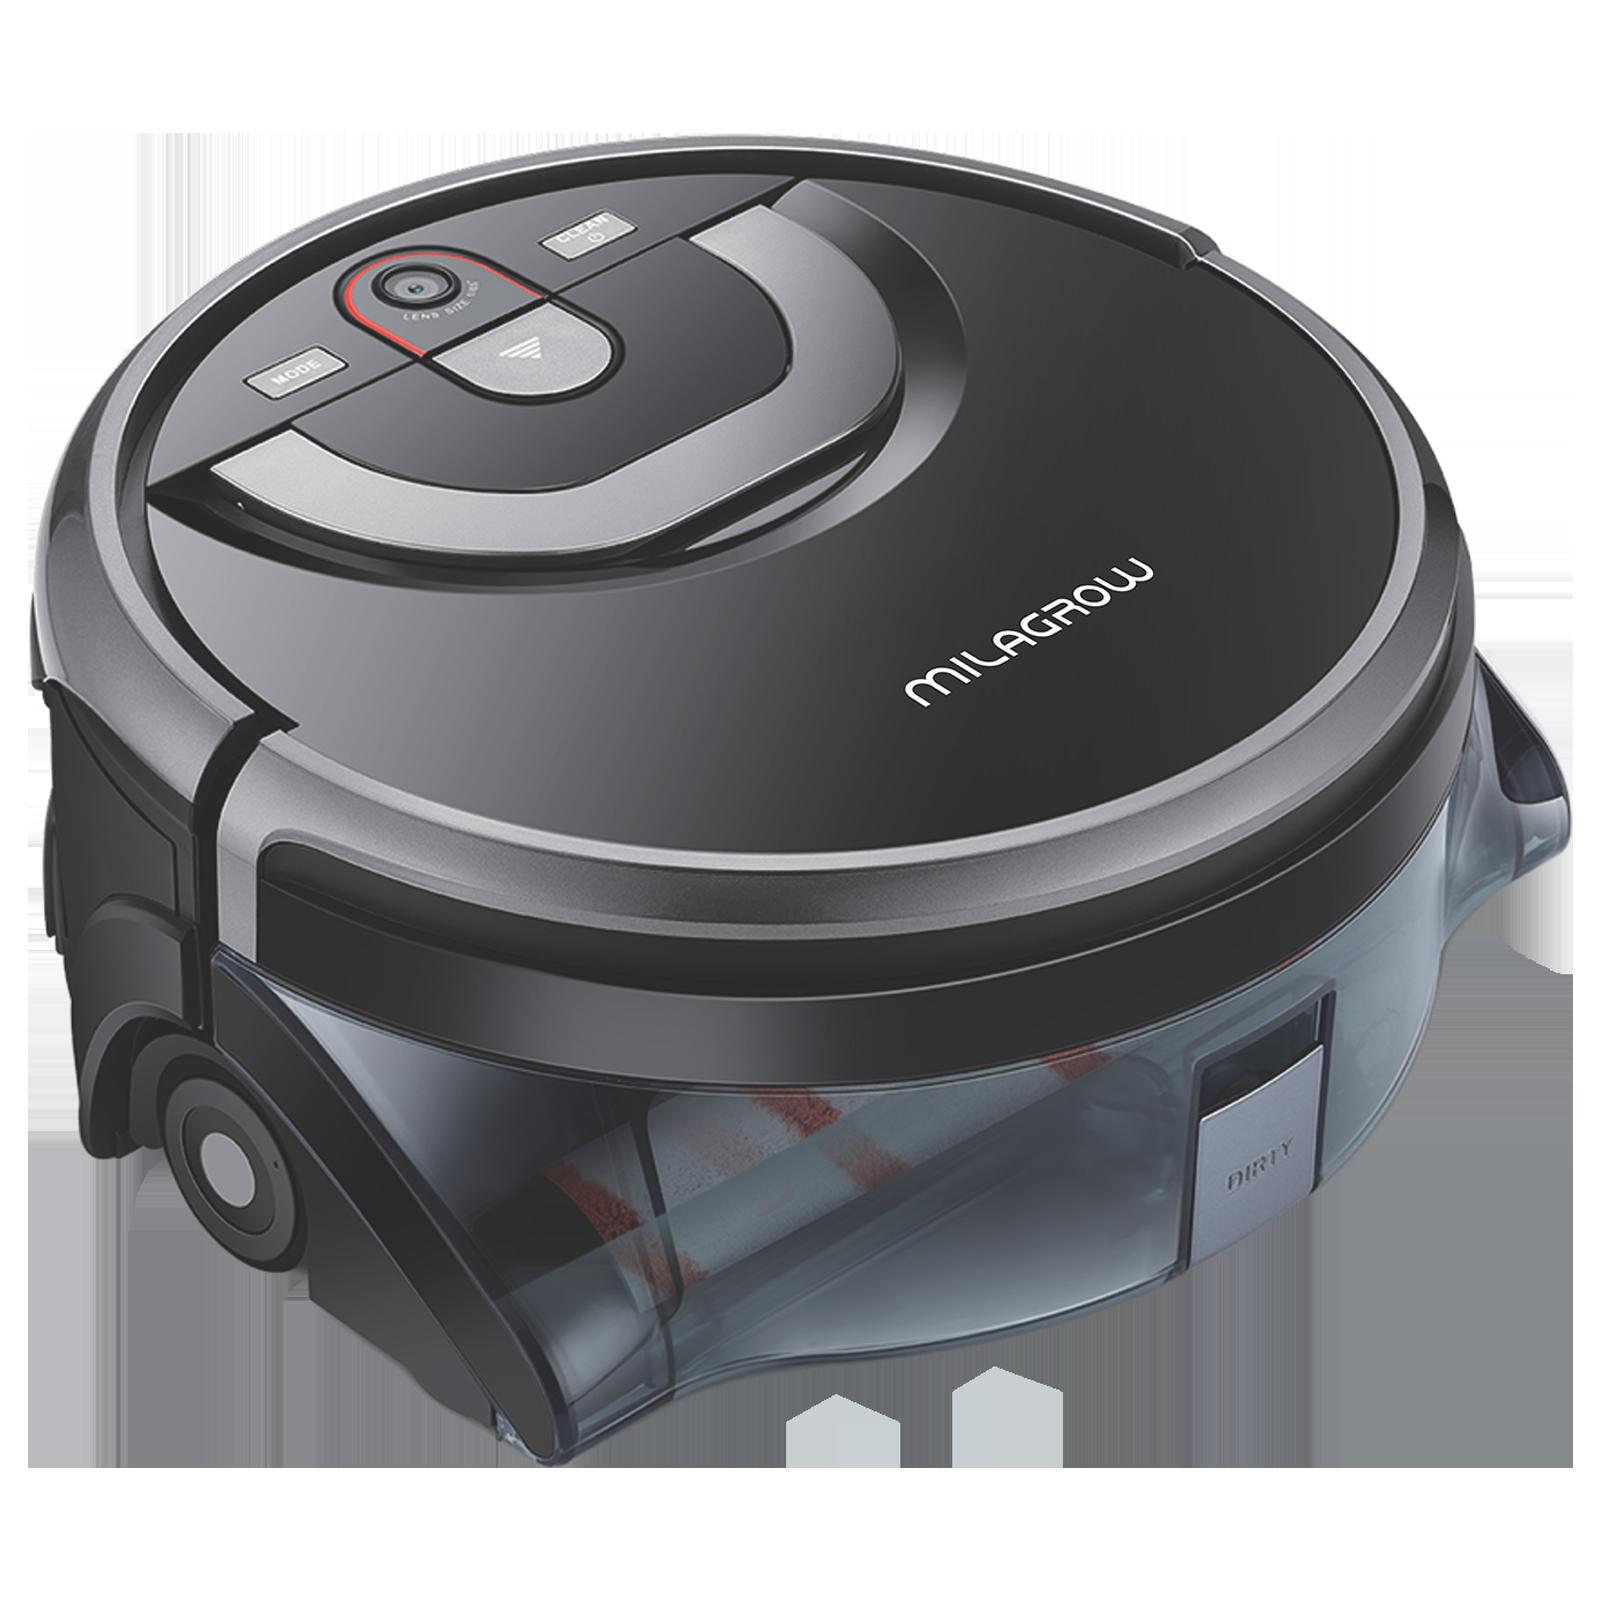 Milagrow AguaBot 21 11.4 Watts Robotic Vacuum Cleaner (0.9 Litres Tank, MGRV25, Black/Silver)_1